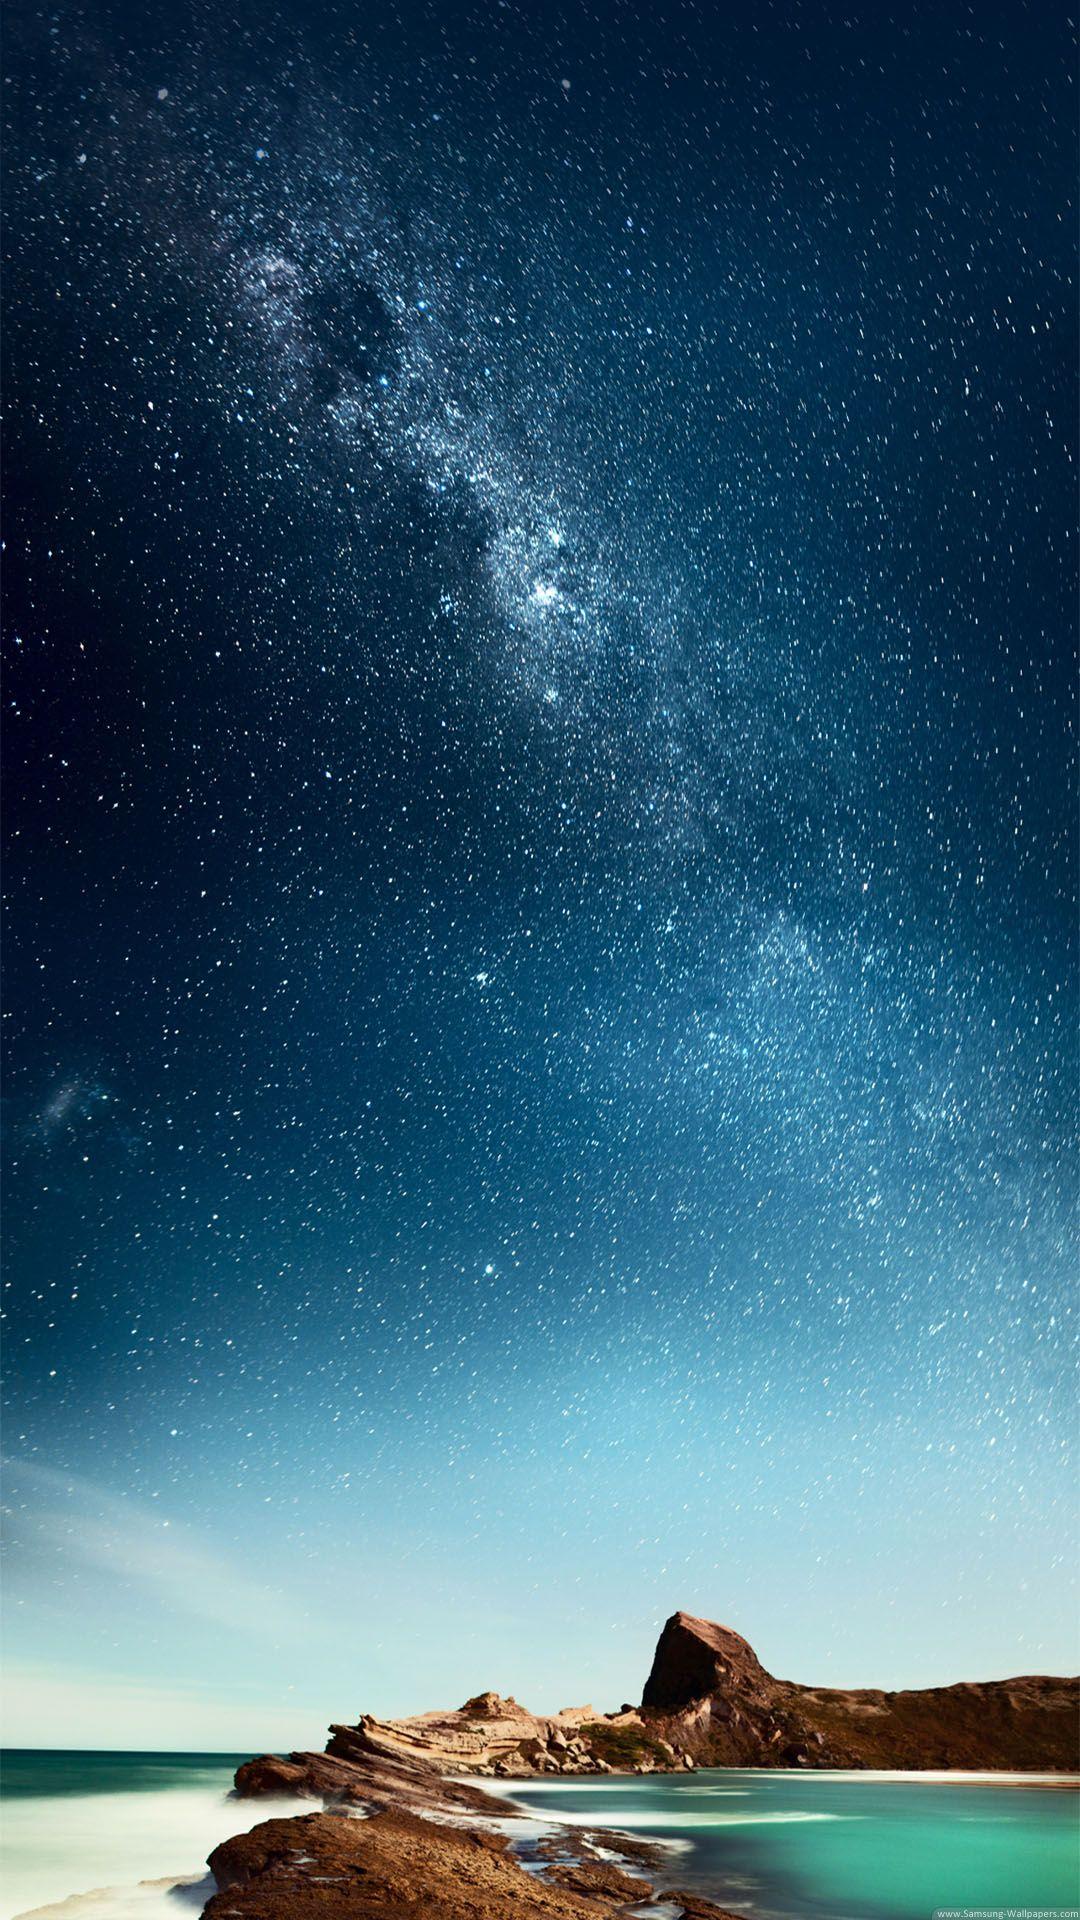 hinh nen samsung galaxy 8